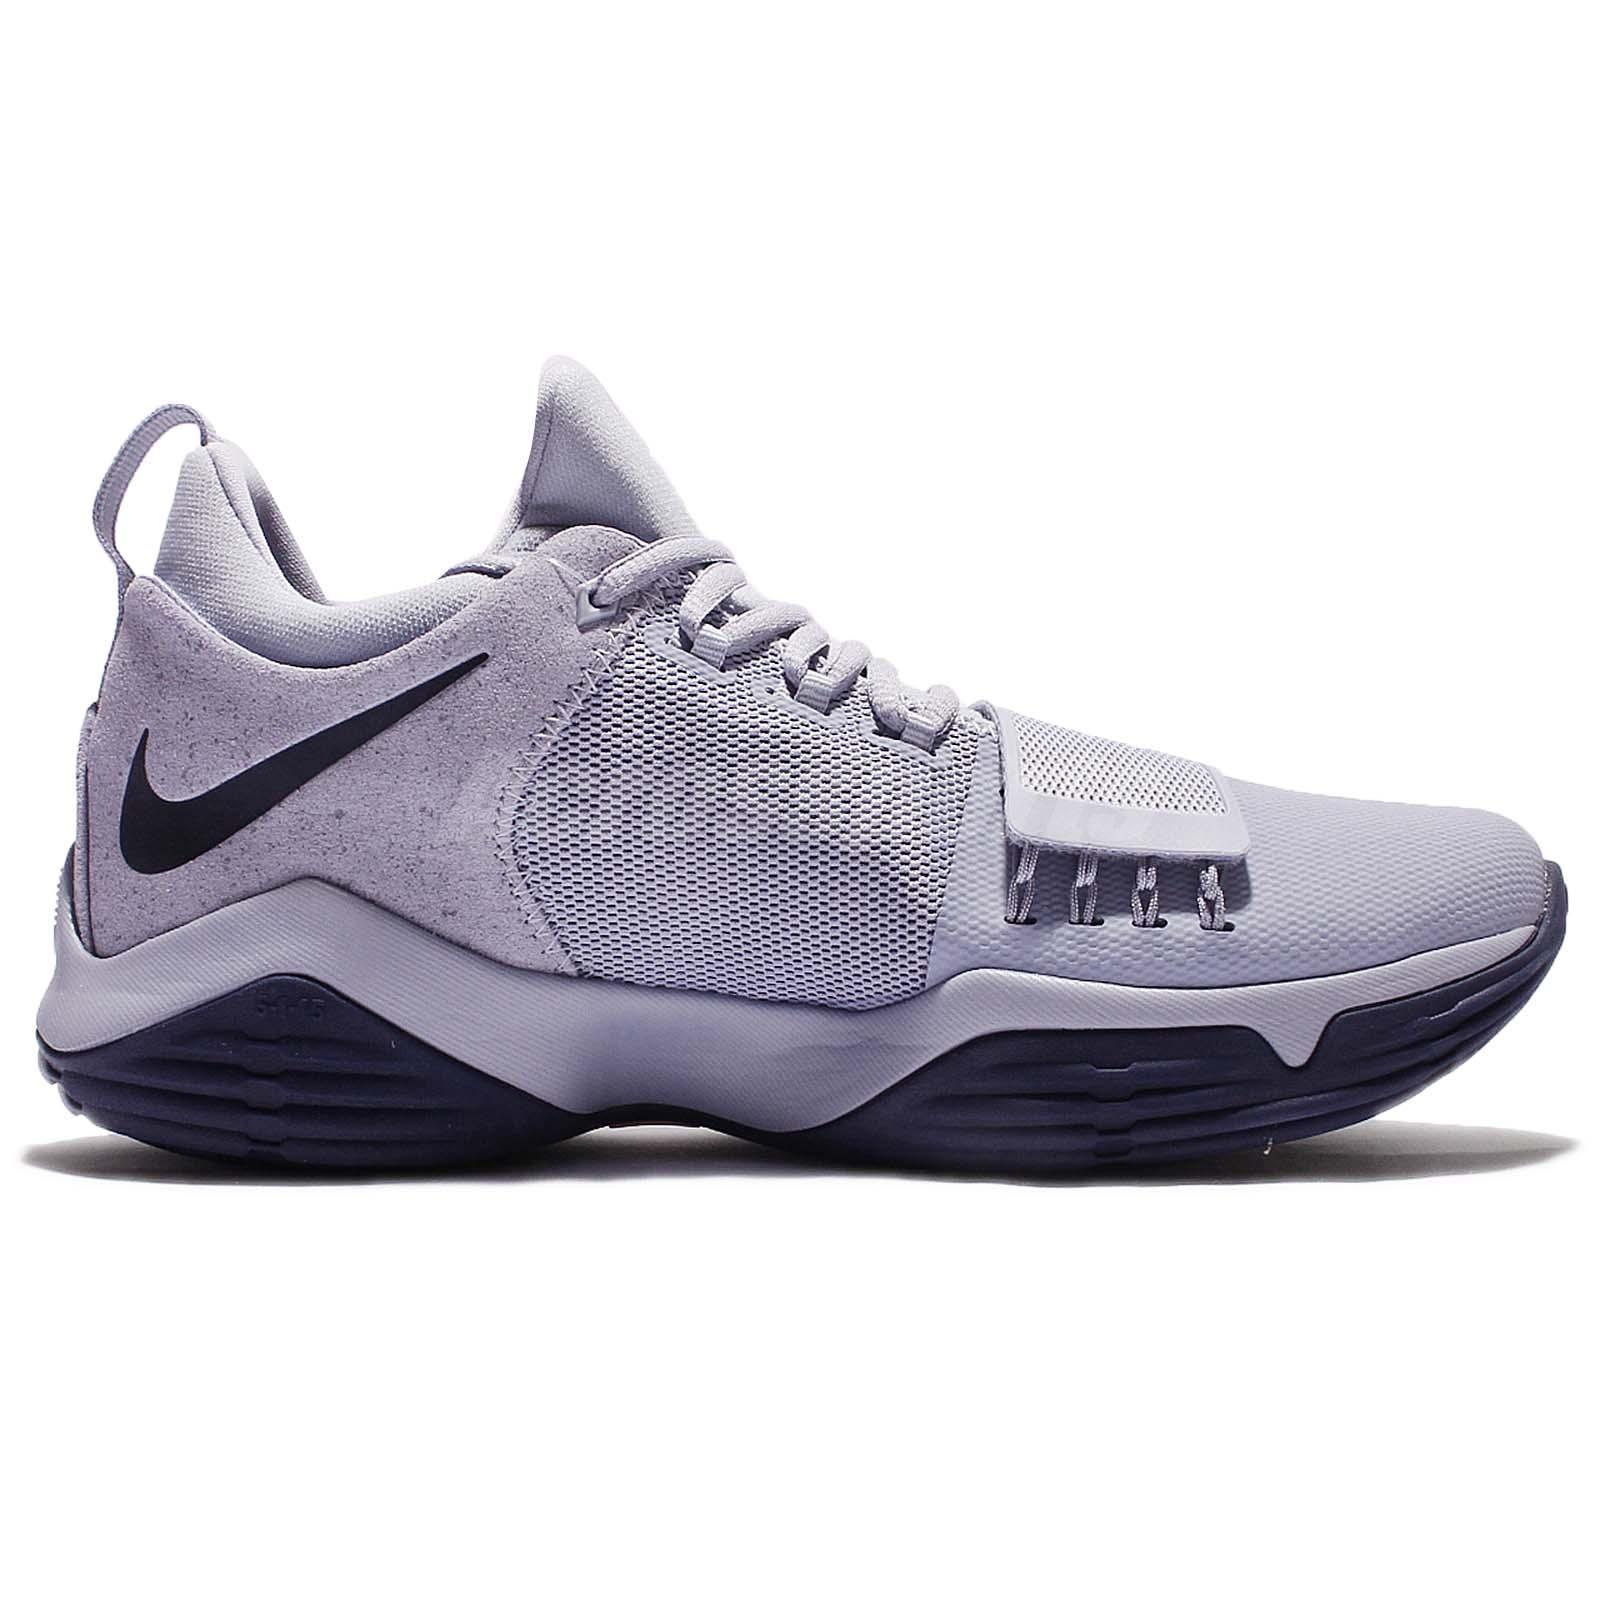 e31b9a02f6374a Nike PG 1 EP XDR Paul George Glacier Grey Navy 13 Men Basketball ...